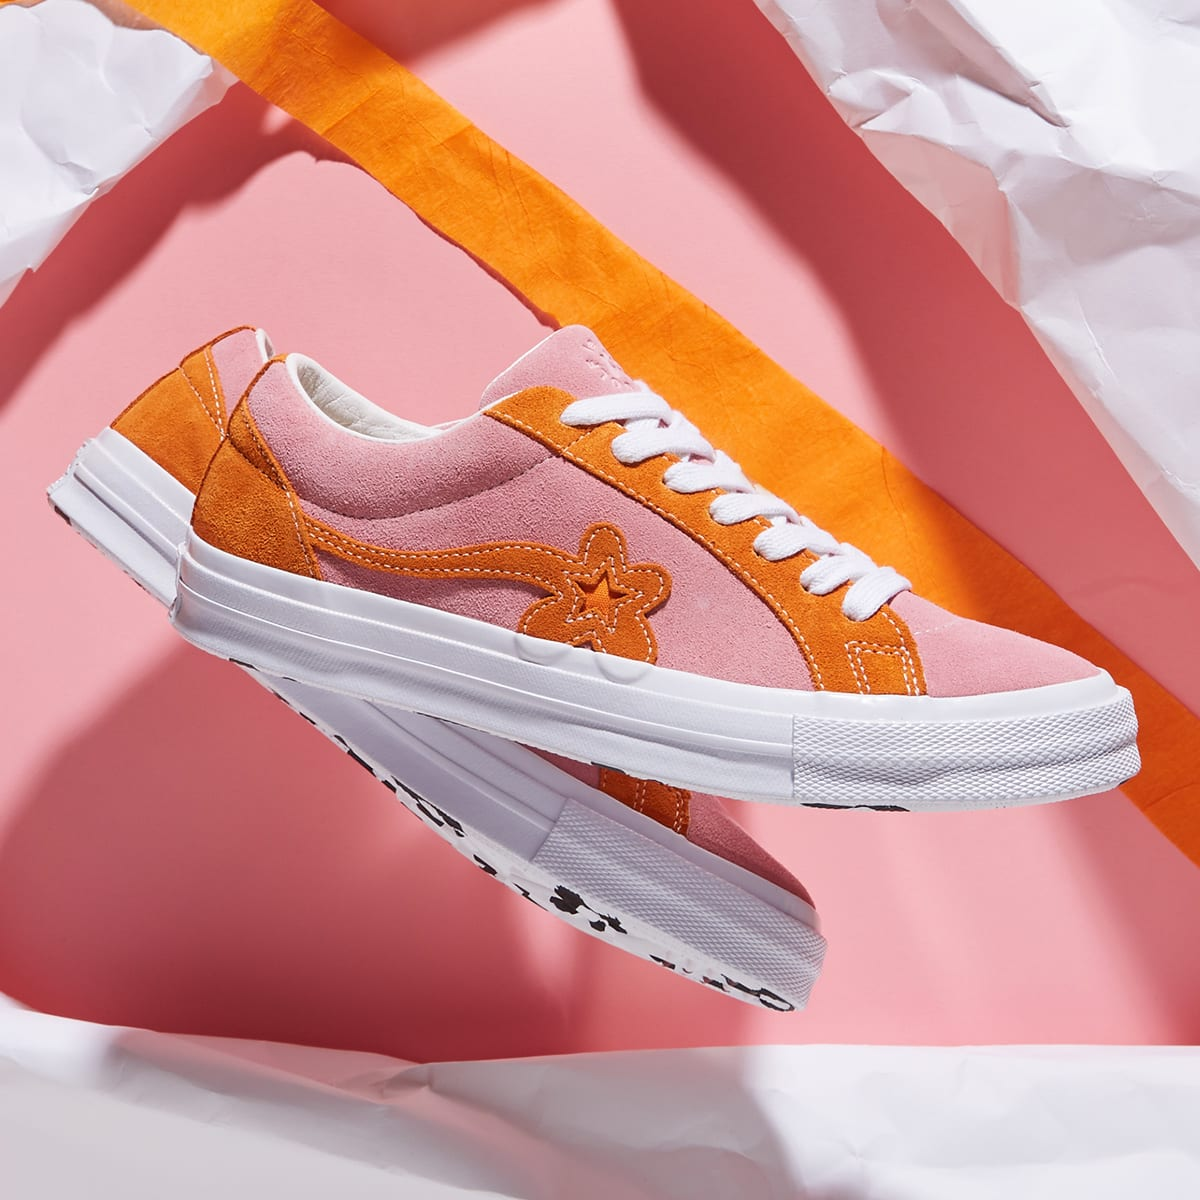 Converse X Golf Le Fleur Two Tones Candy Pink Orange White